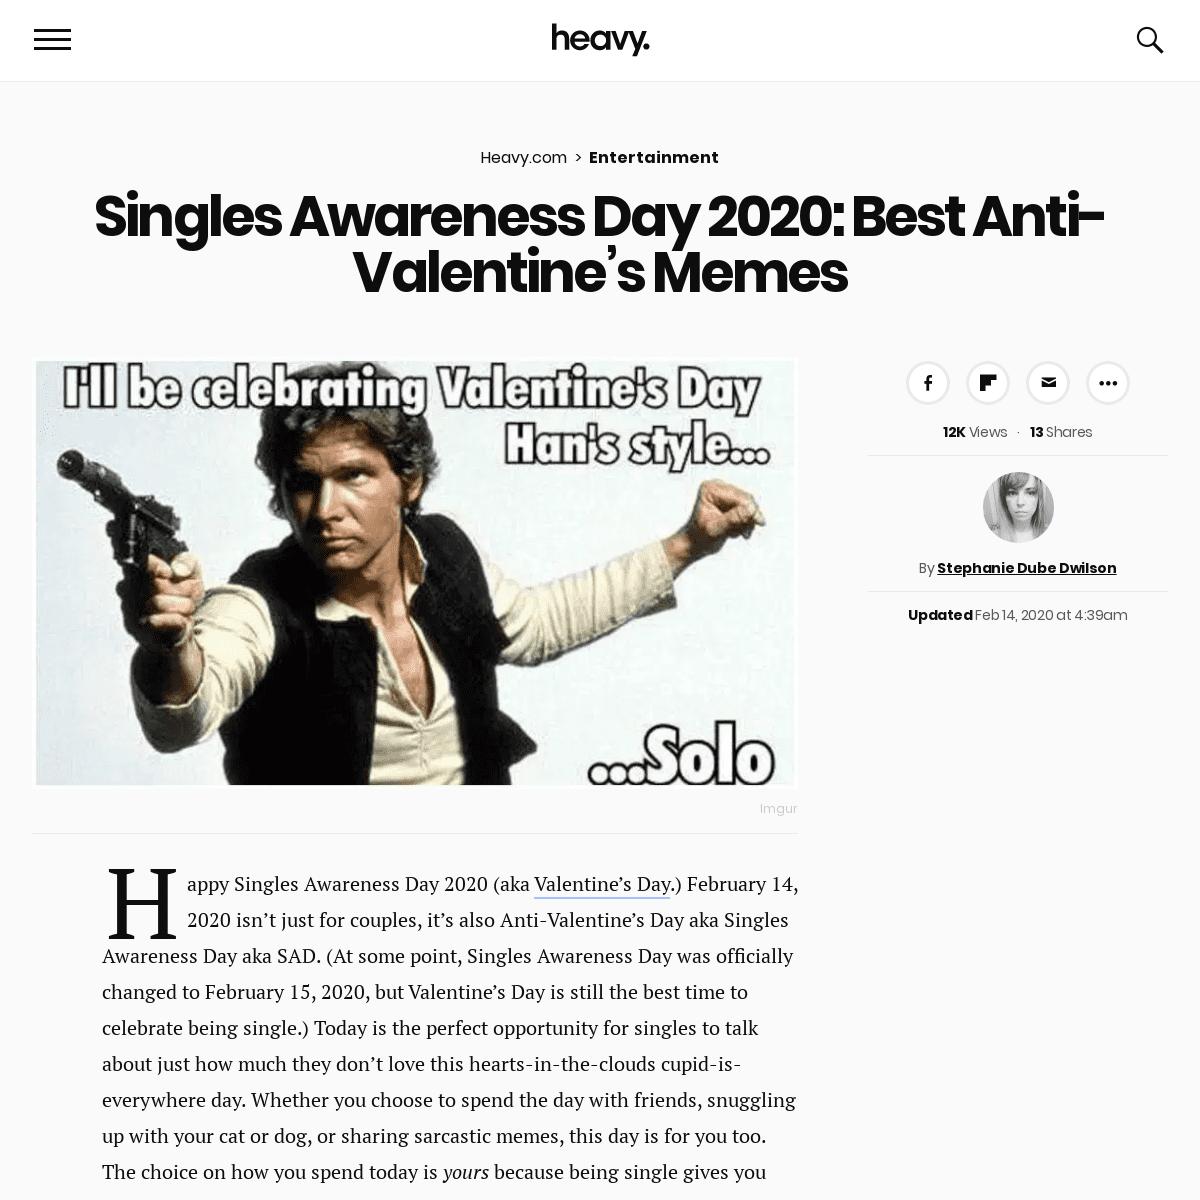 ArchiveBay.com - heavy.com/entertainment/2020/02/anti-valentines-single-memes-2020/ - Singles Awareness Day 2020- Best Anti-Valentine's Memes - Heavy.com